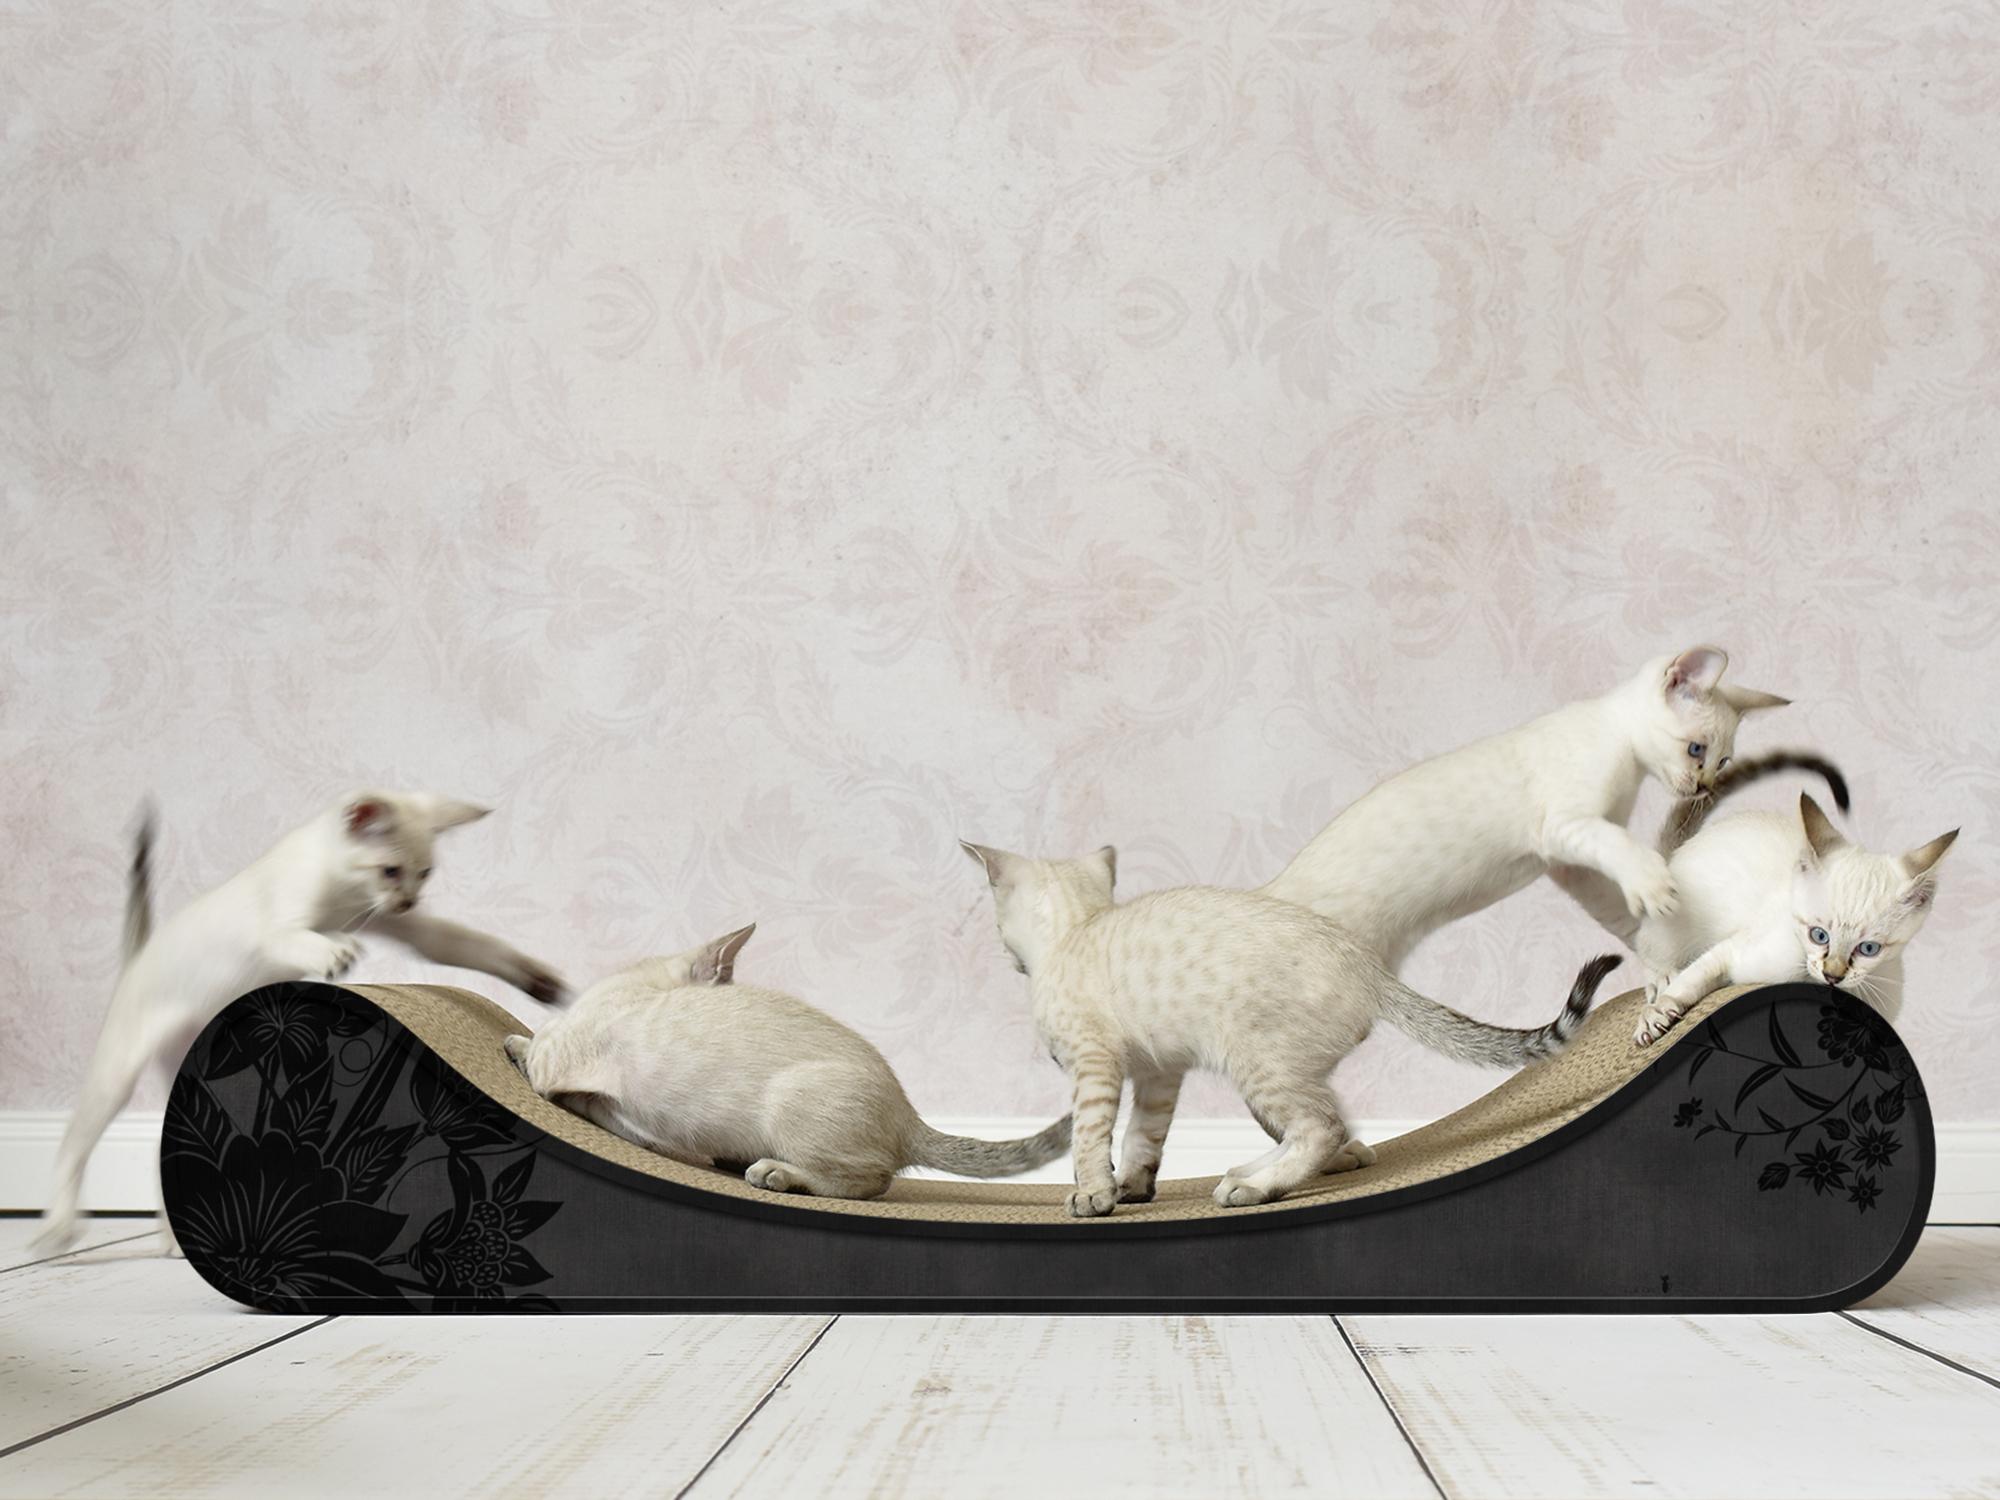 cardboard cat scratcher Le Divan, color: 013b